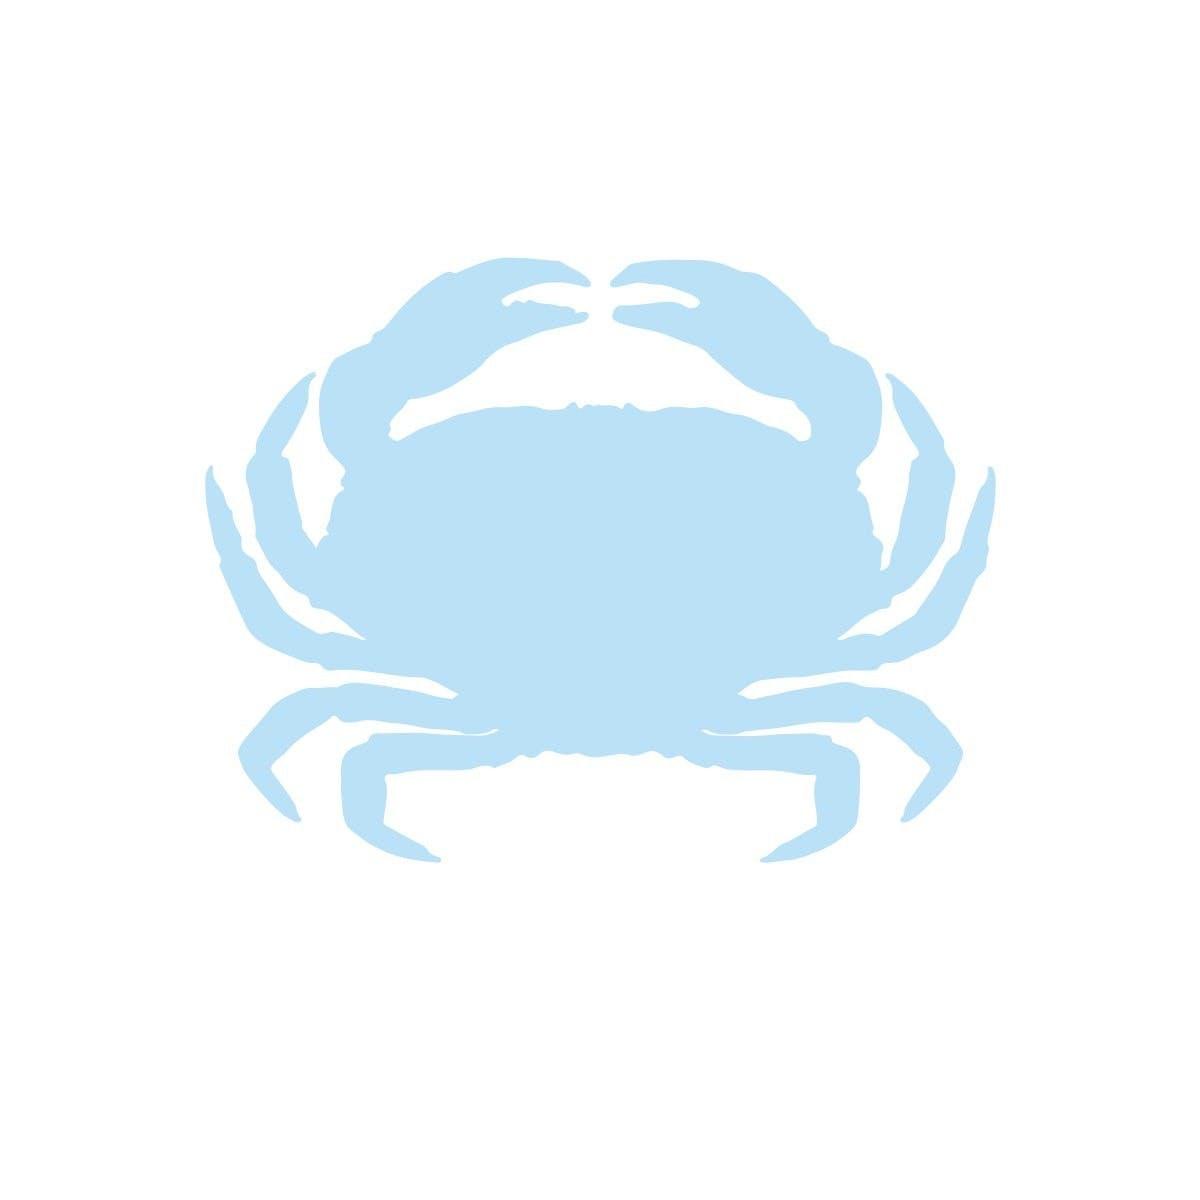 Crab Image - 2